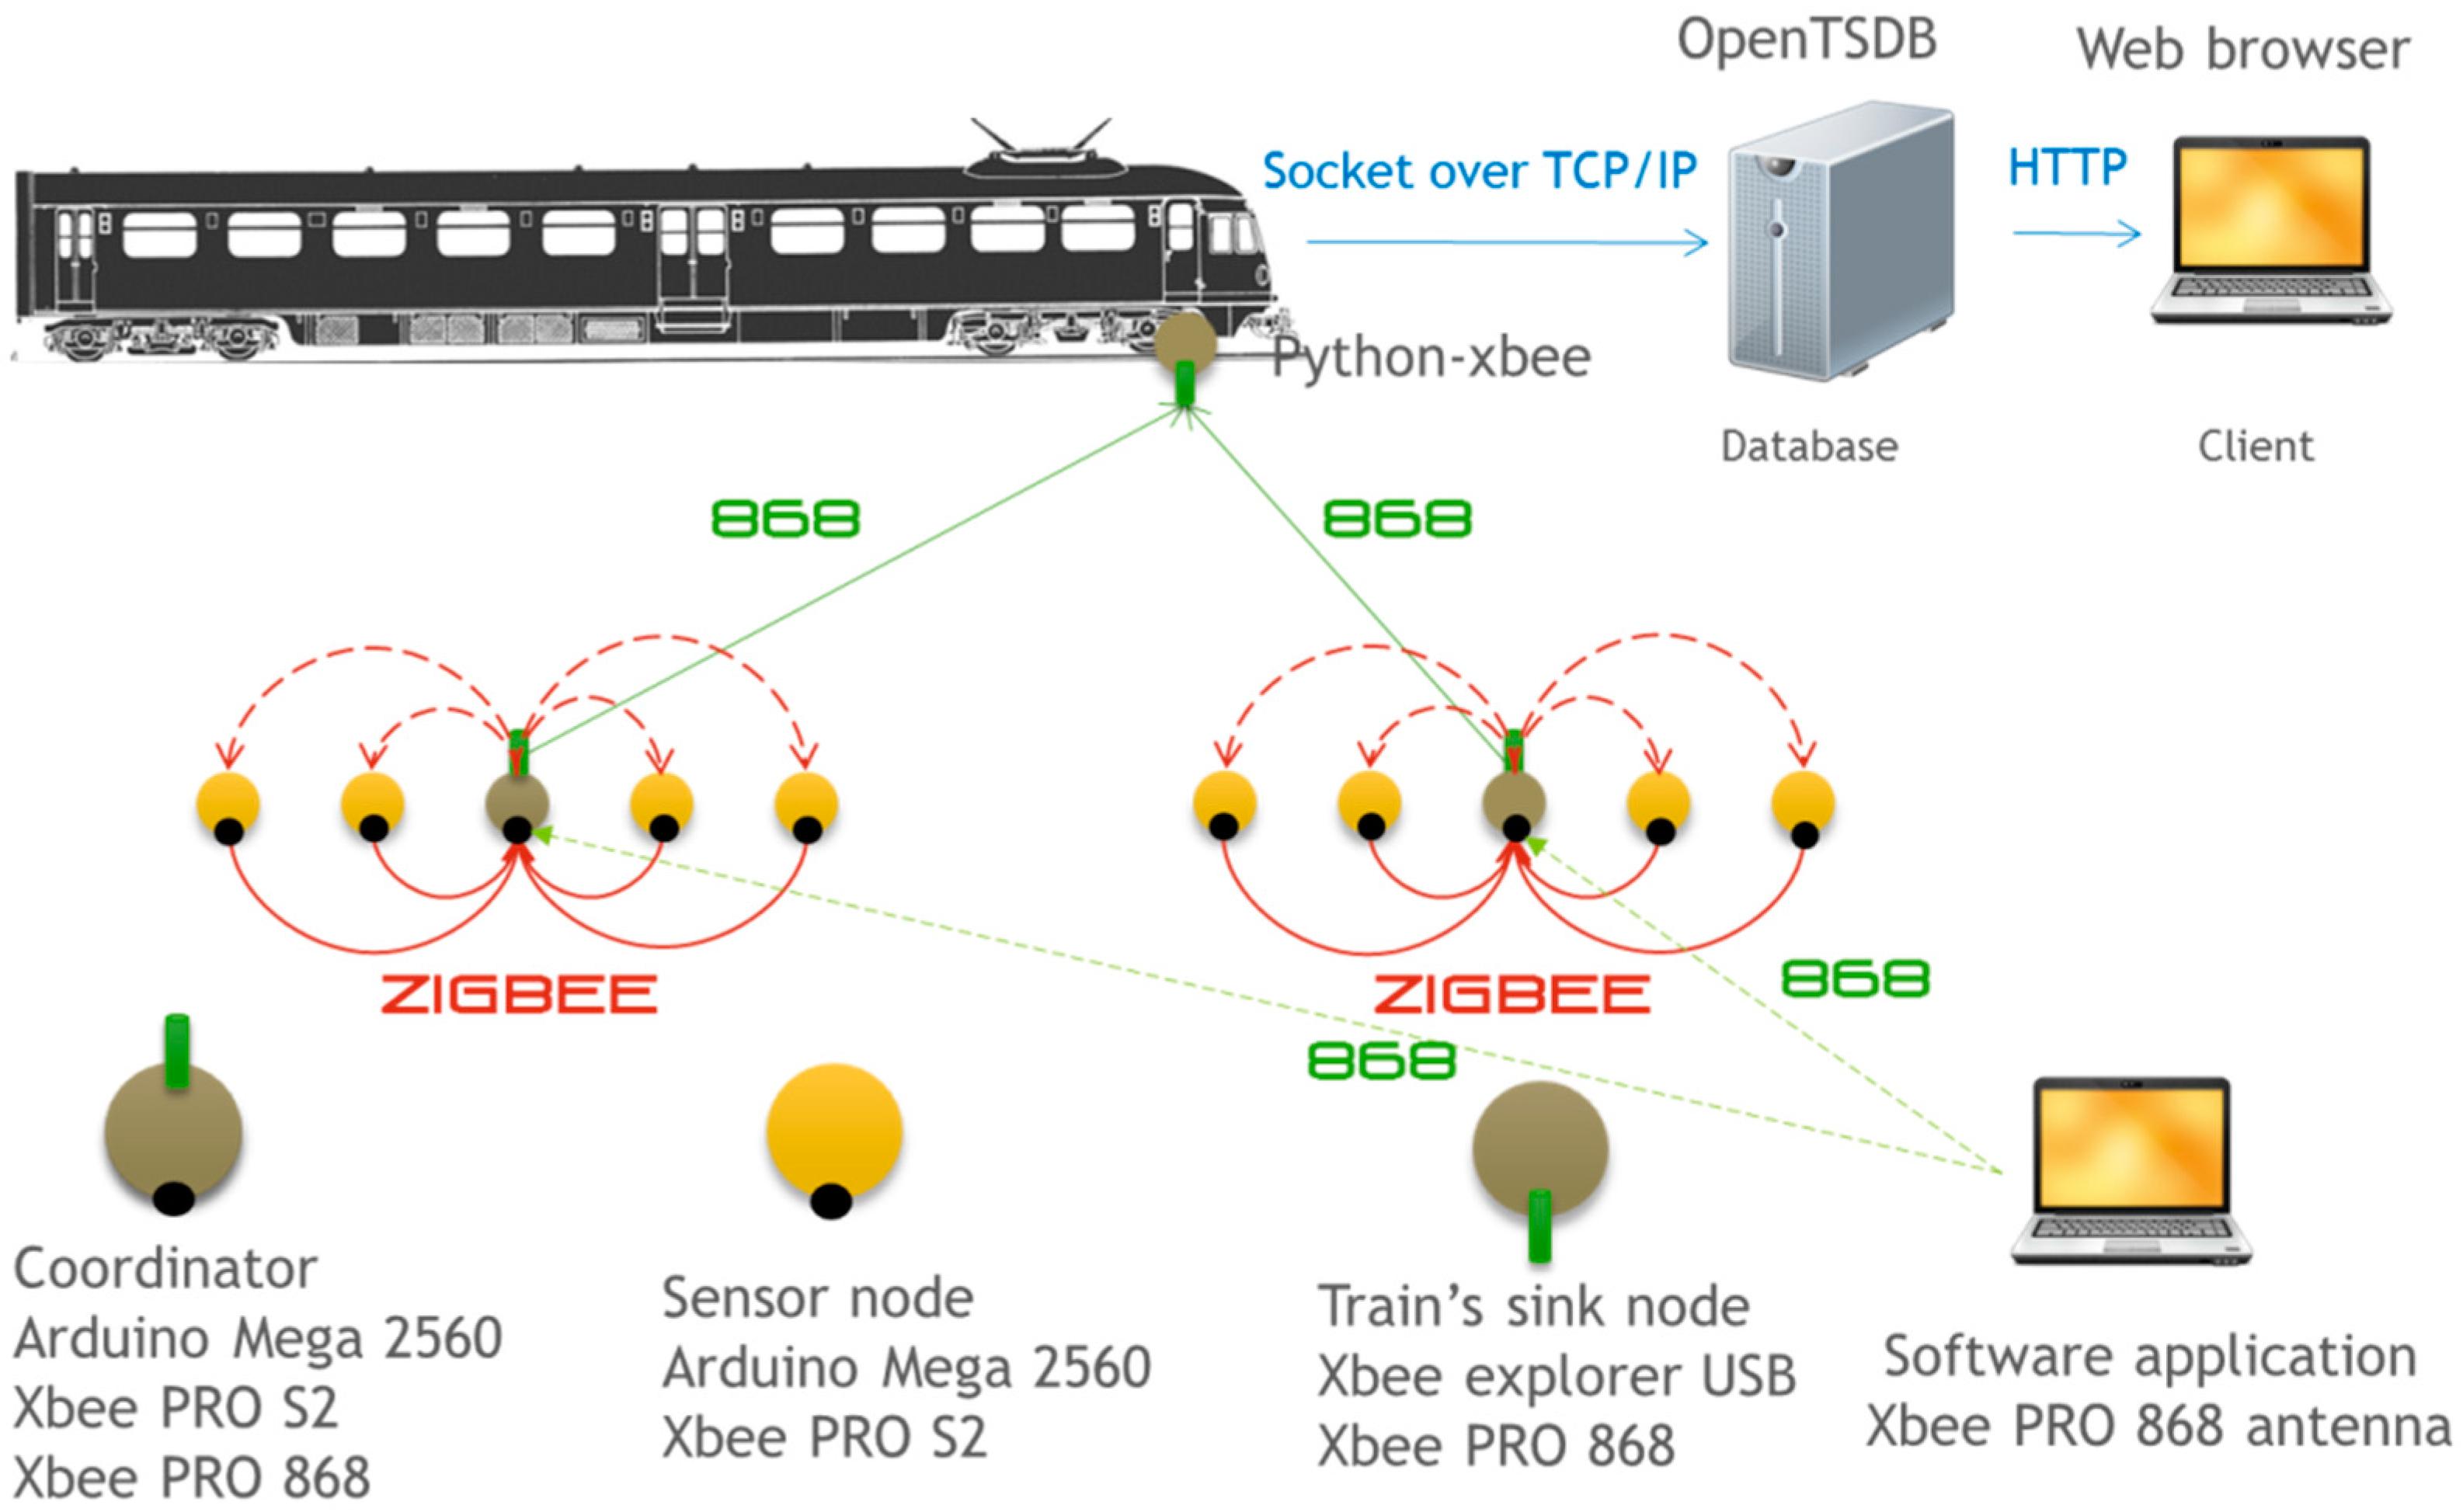 Sensors Free Full Text Using Wireless Sensor Networks And Trains Mega 450 Wiring Diagram 15 15101 G016 1024